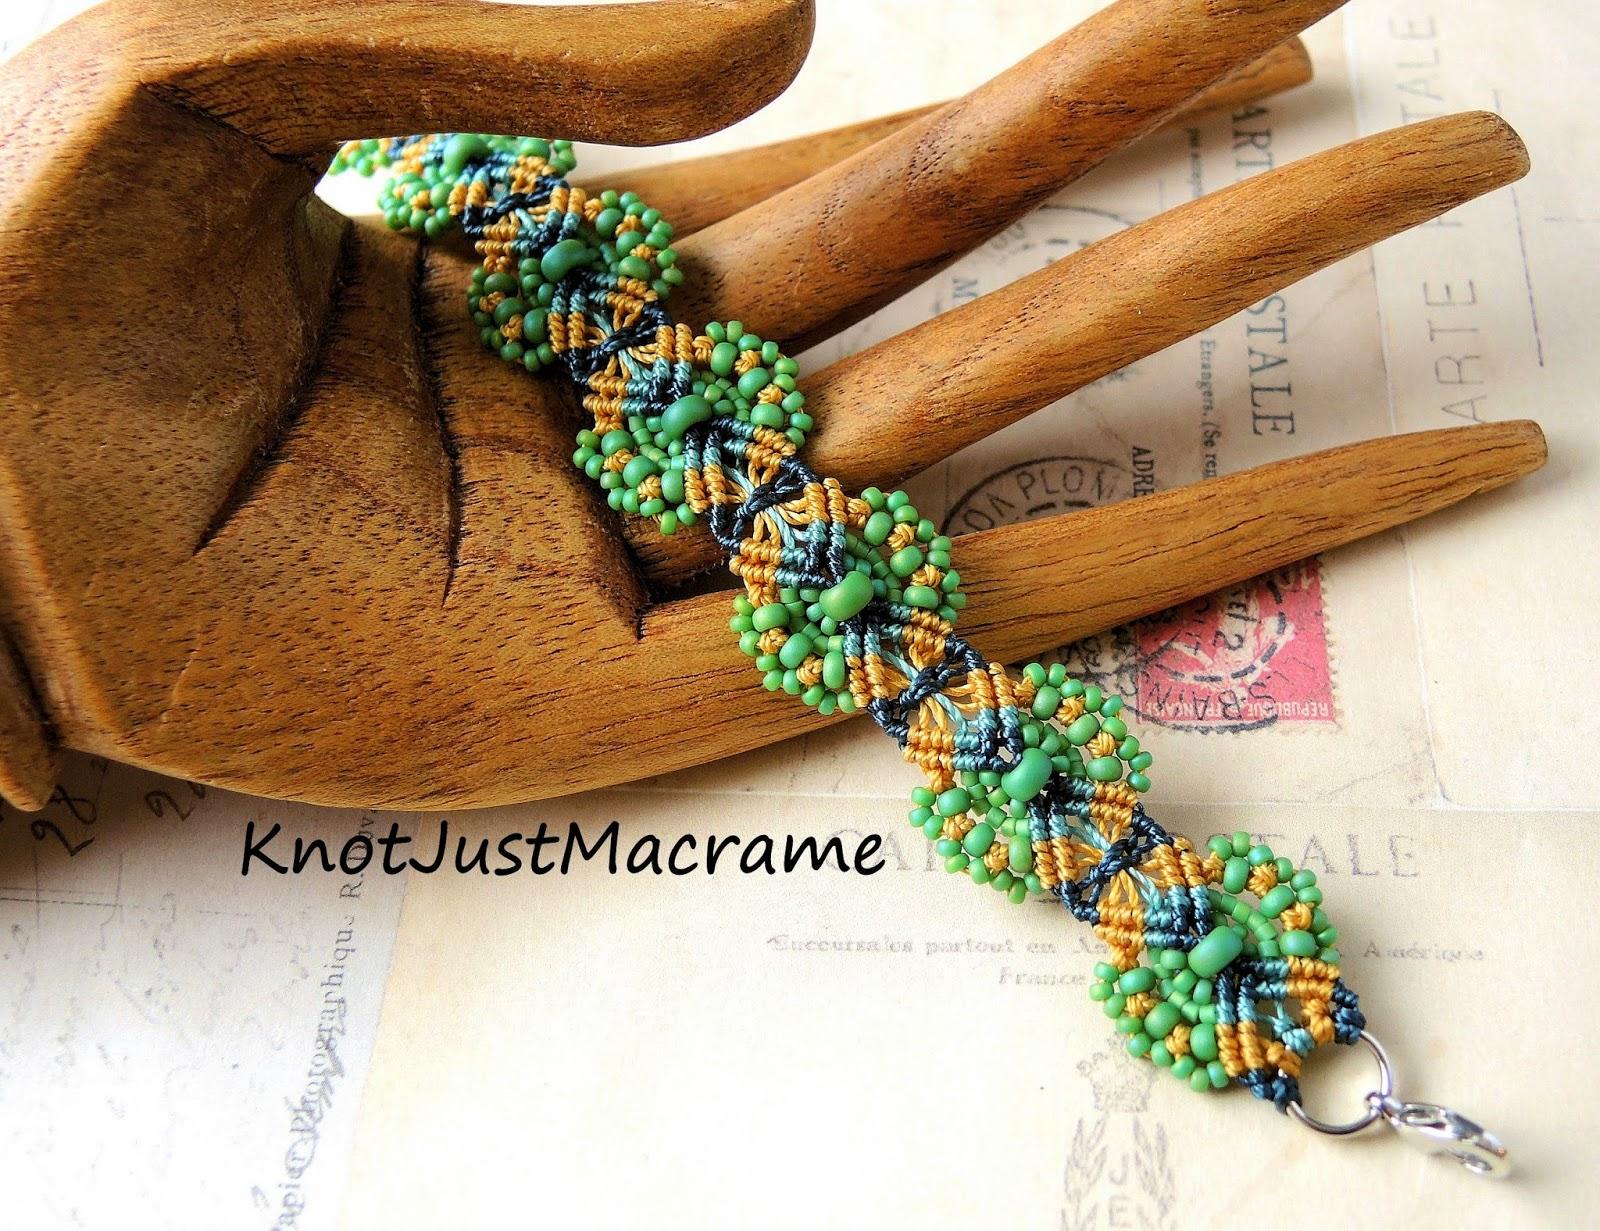 Hydrangea micro macrame bracelet by Sherri Stokey.